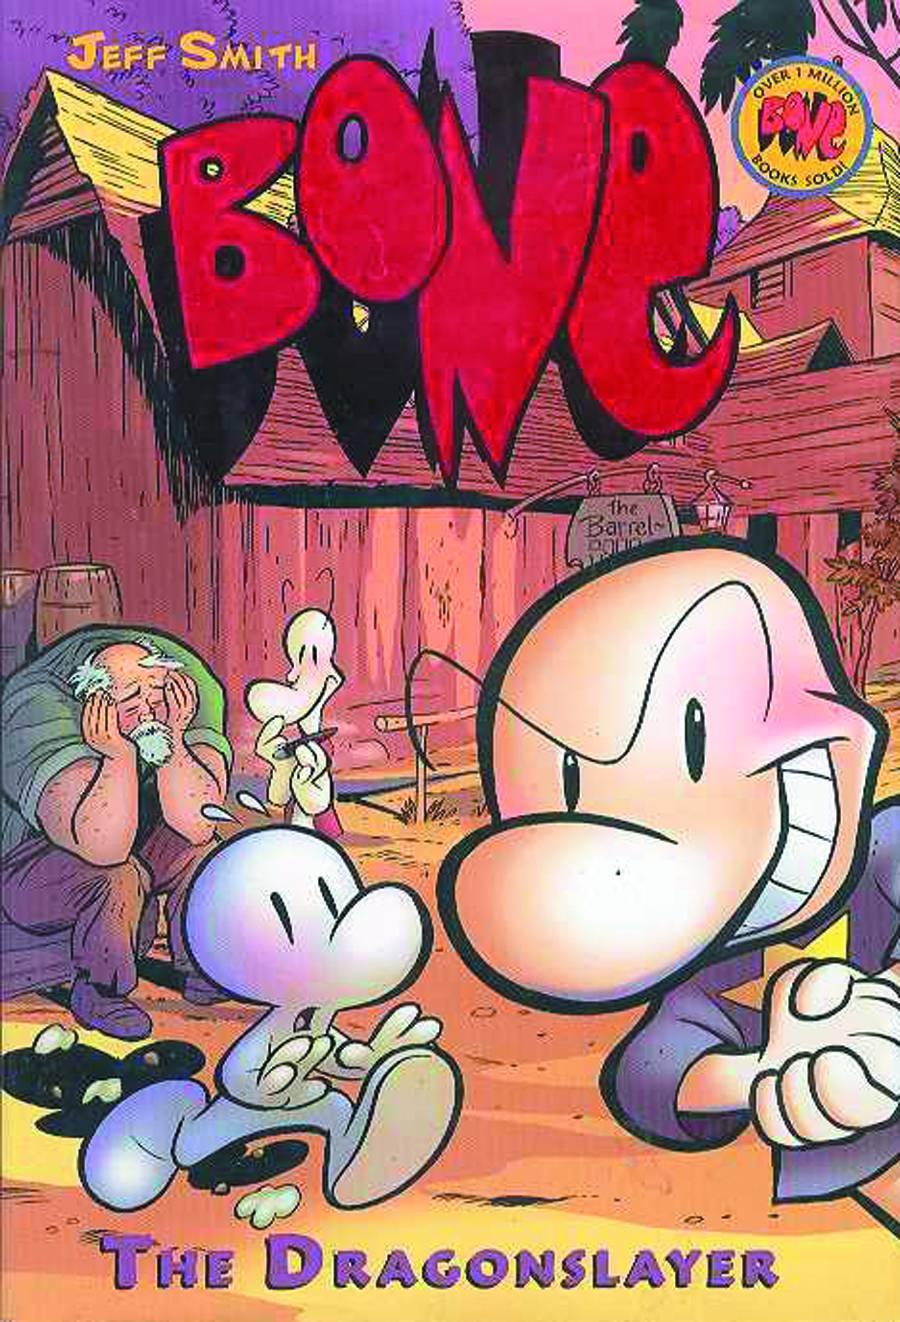 Bone Color Ed SC Vol 04 The Dragonslayer